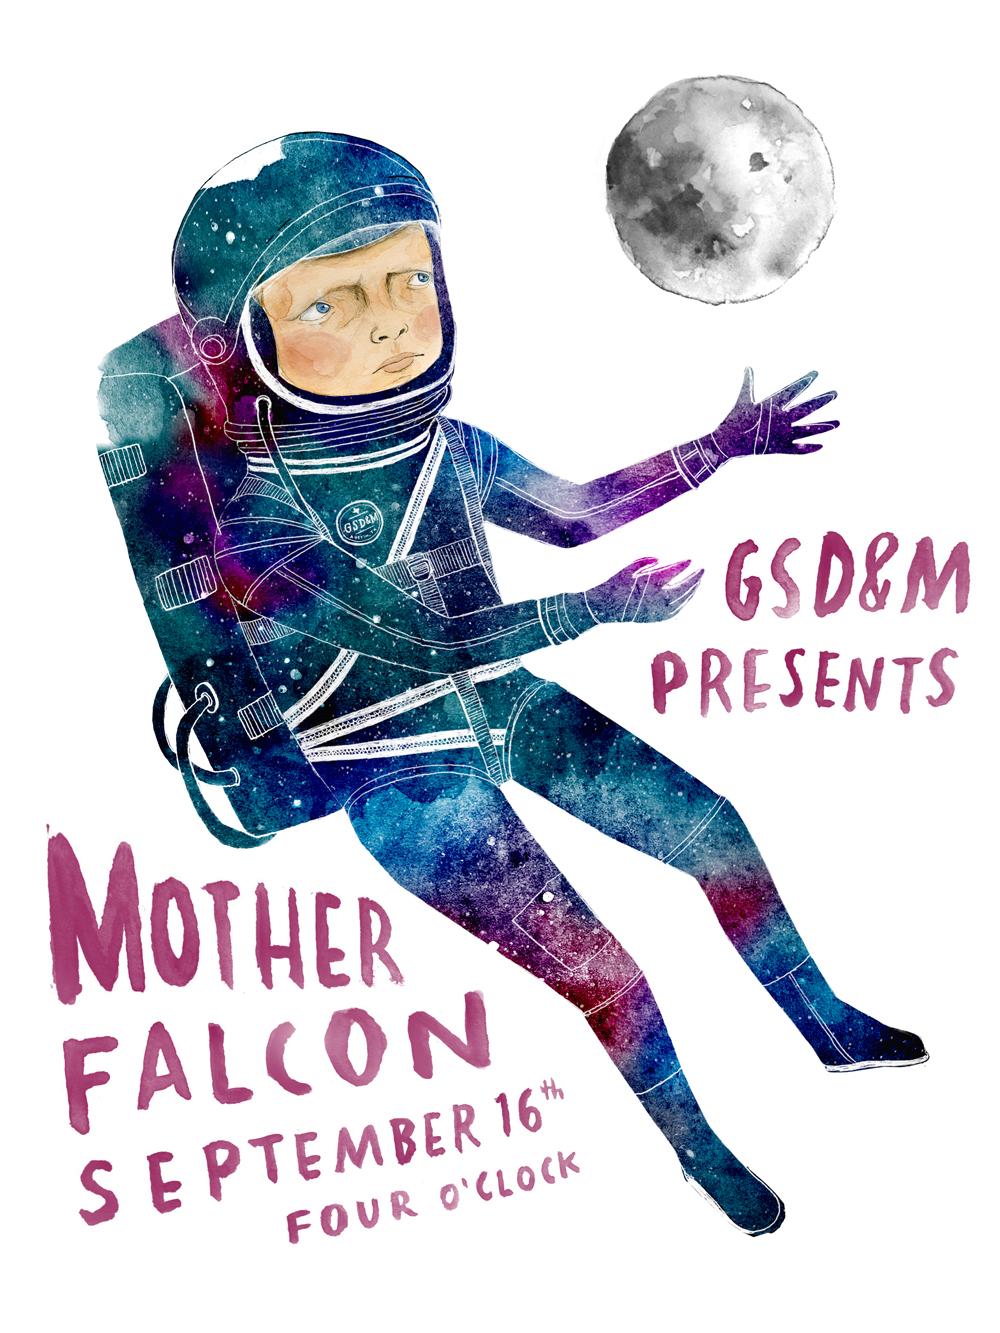 MotherFalcon_poster_FINAL_sm.jpg